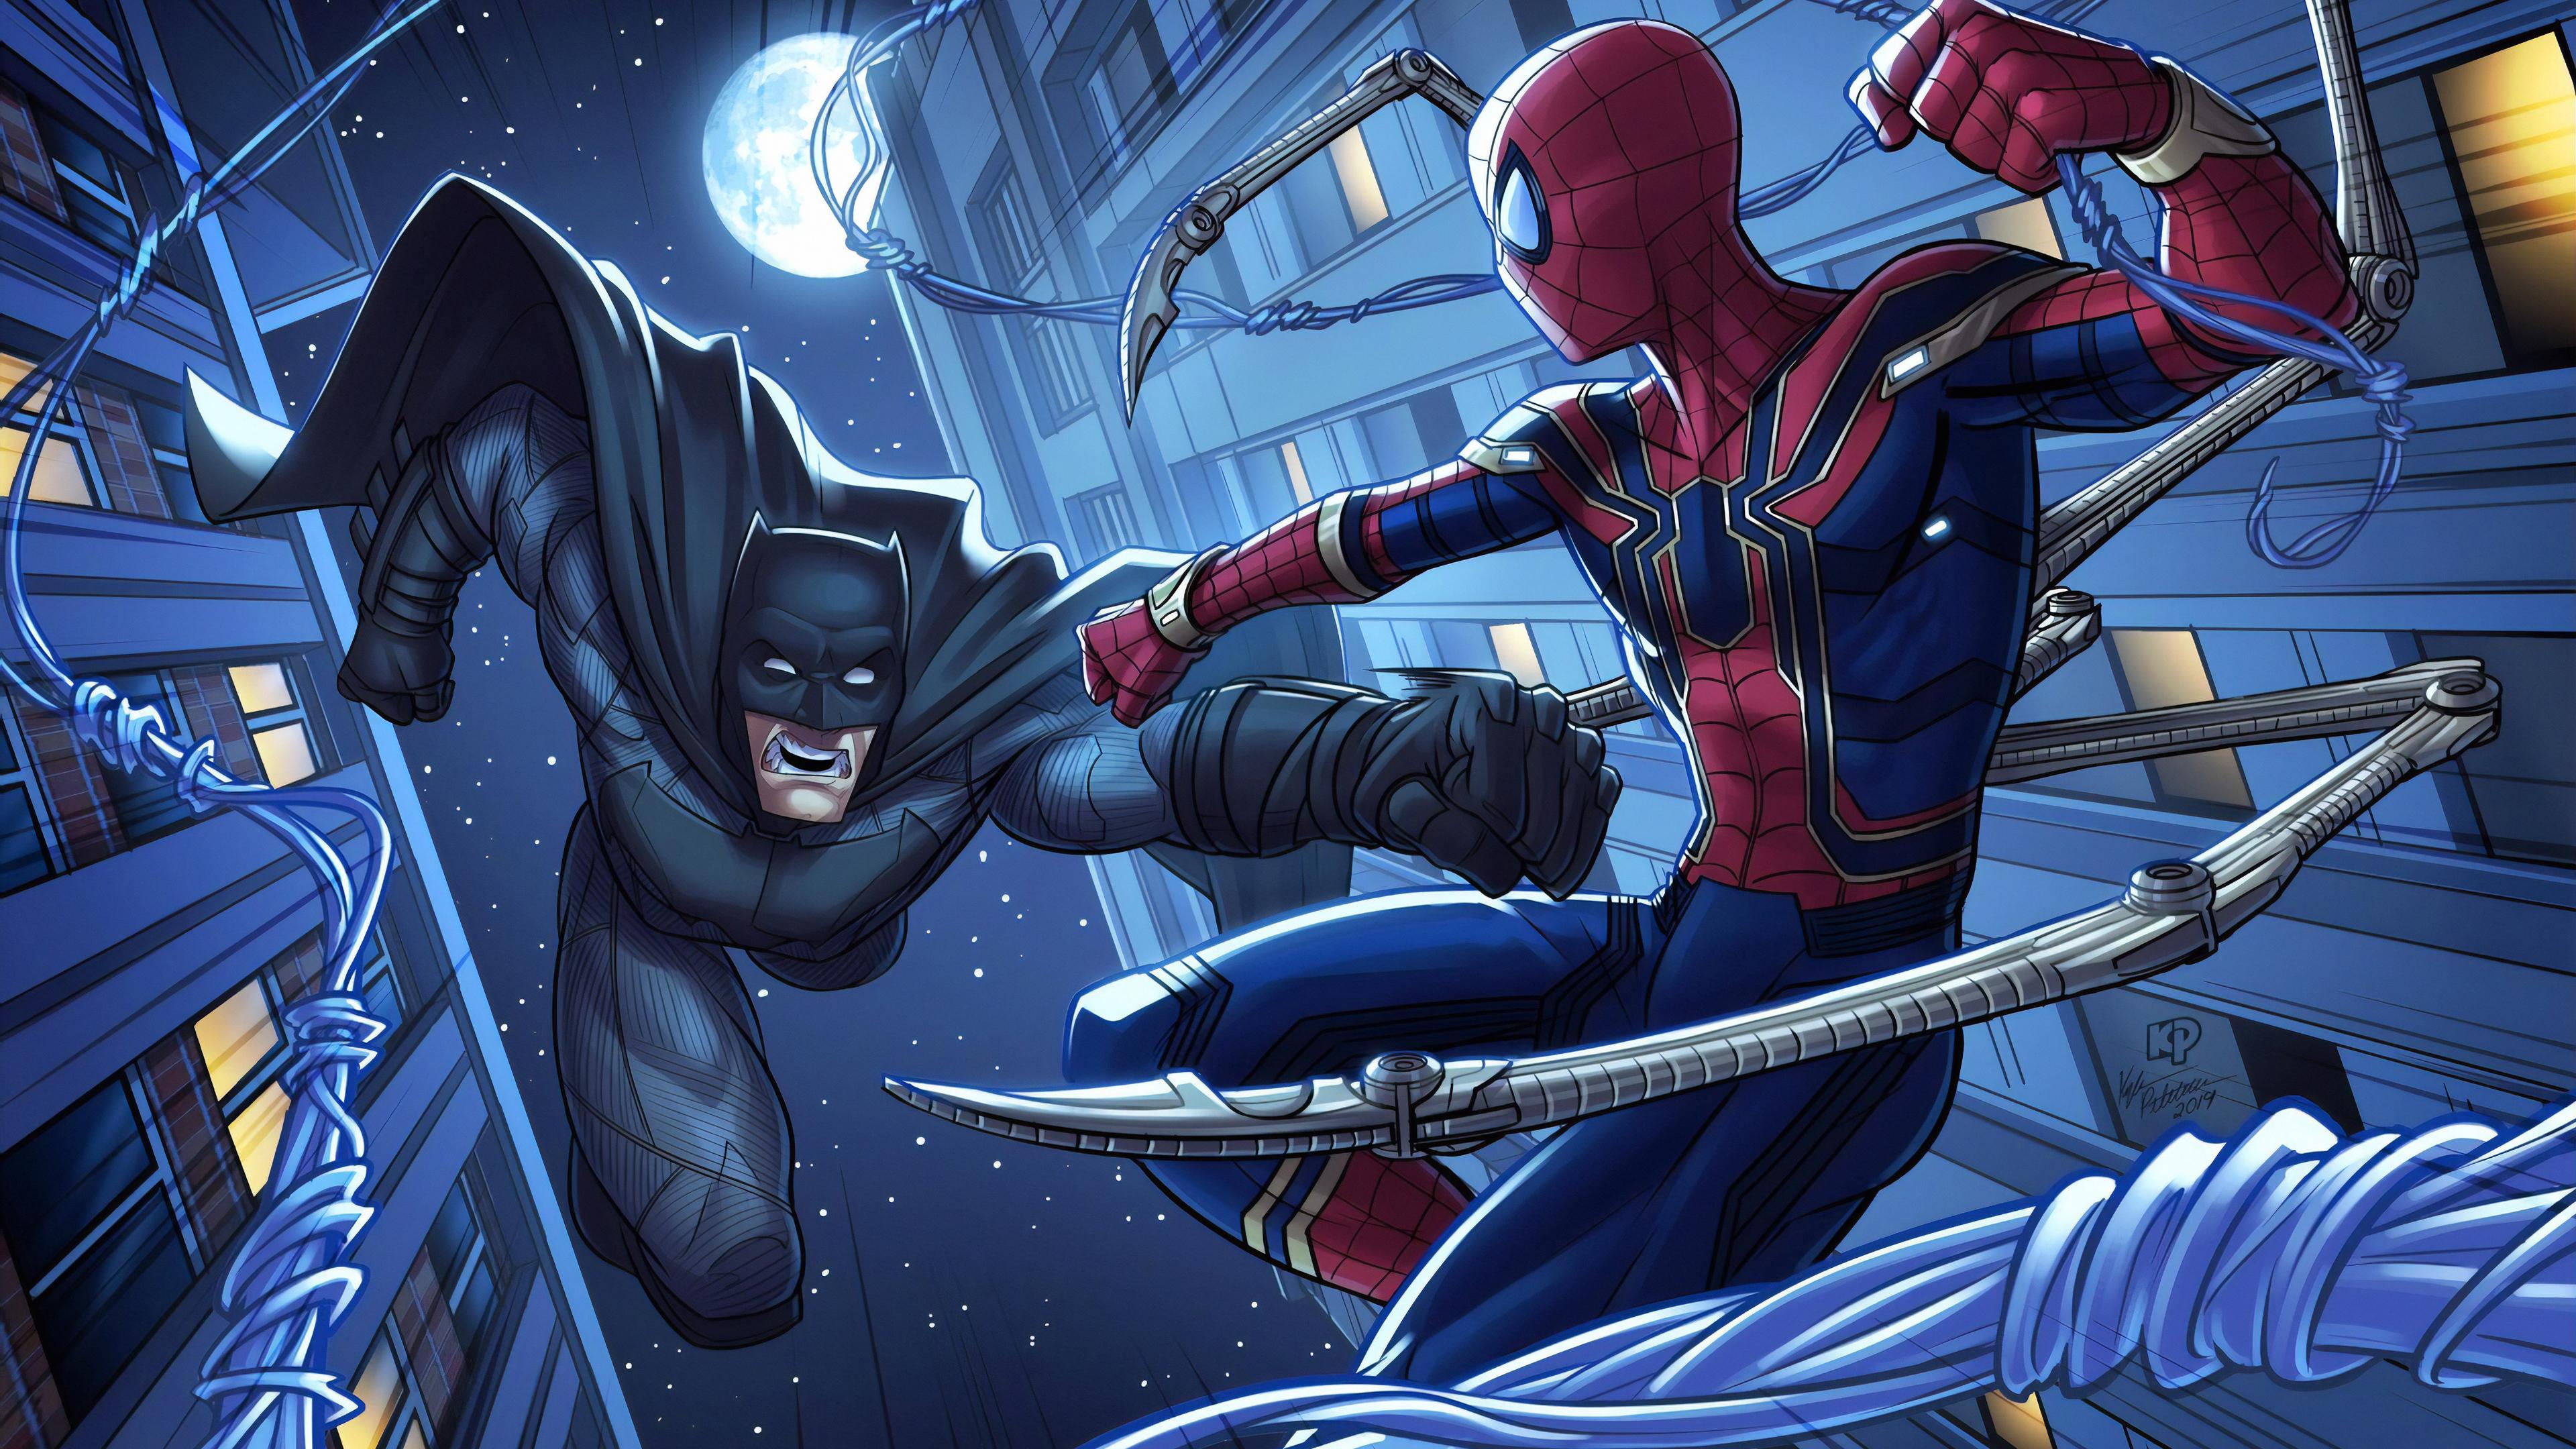 batman and spiderman 1570394309 - Batman And Spiderman - superheroes wallpapers, spiderman wallpapers, hd-wallpapers, batman wallpapers, artwork wallpapers, 4k-wallpapers